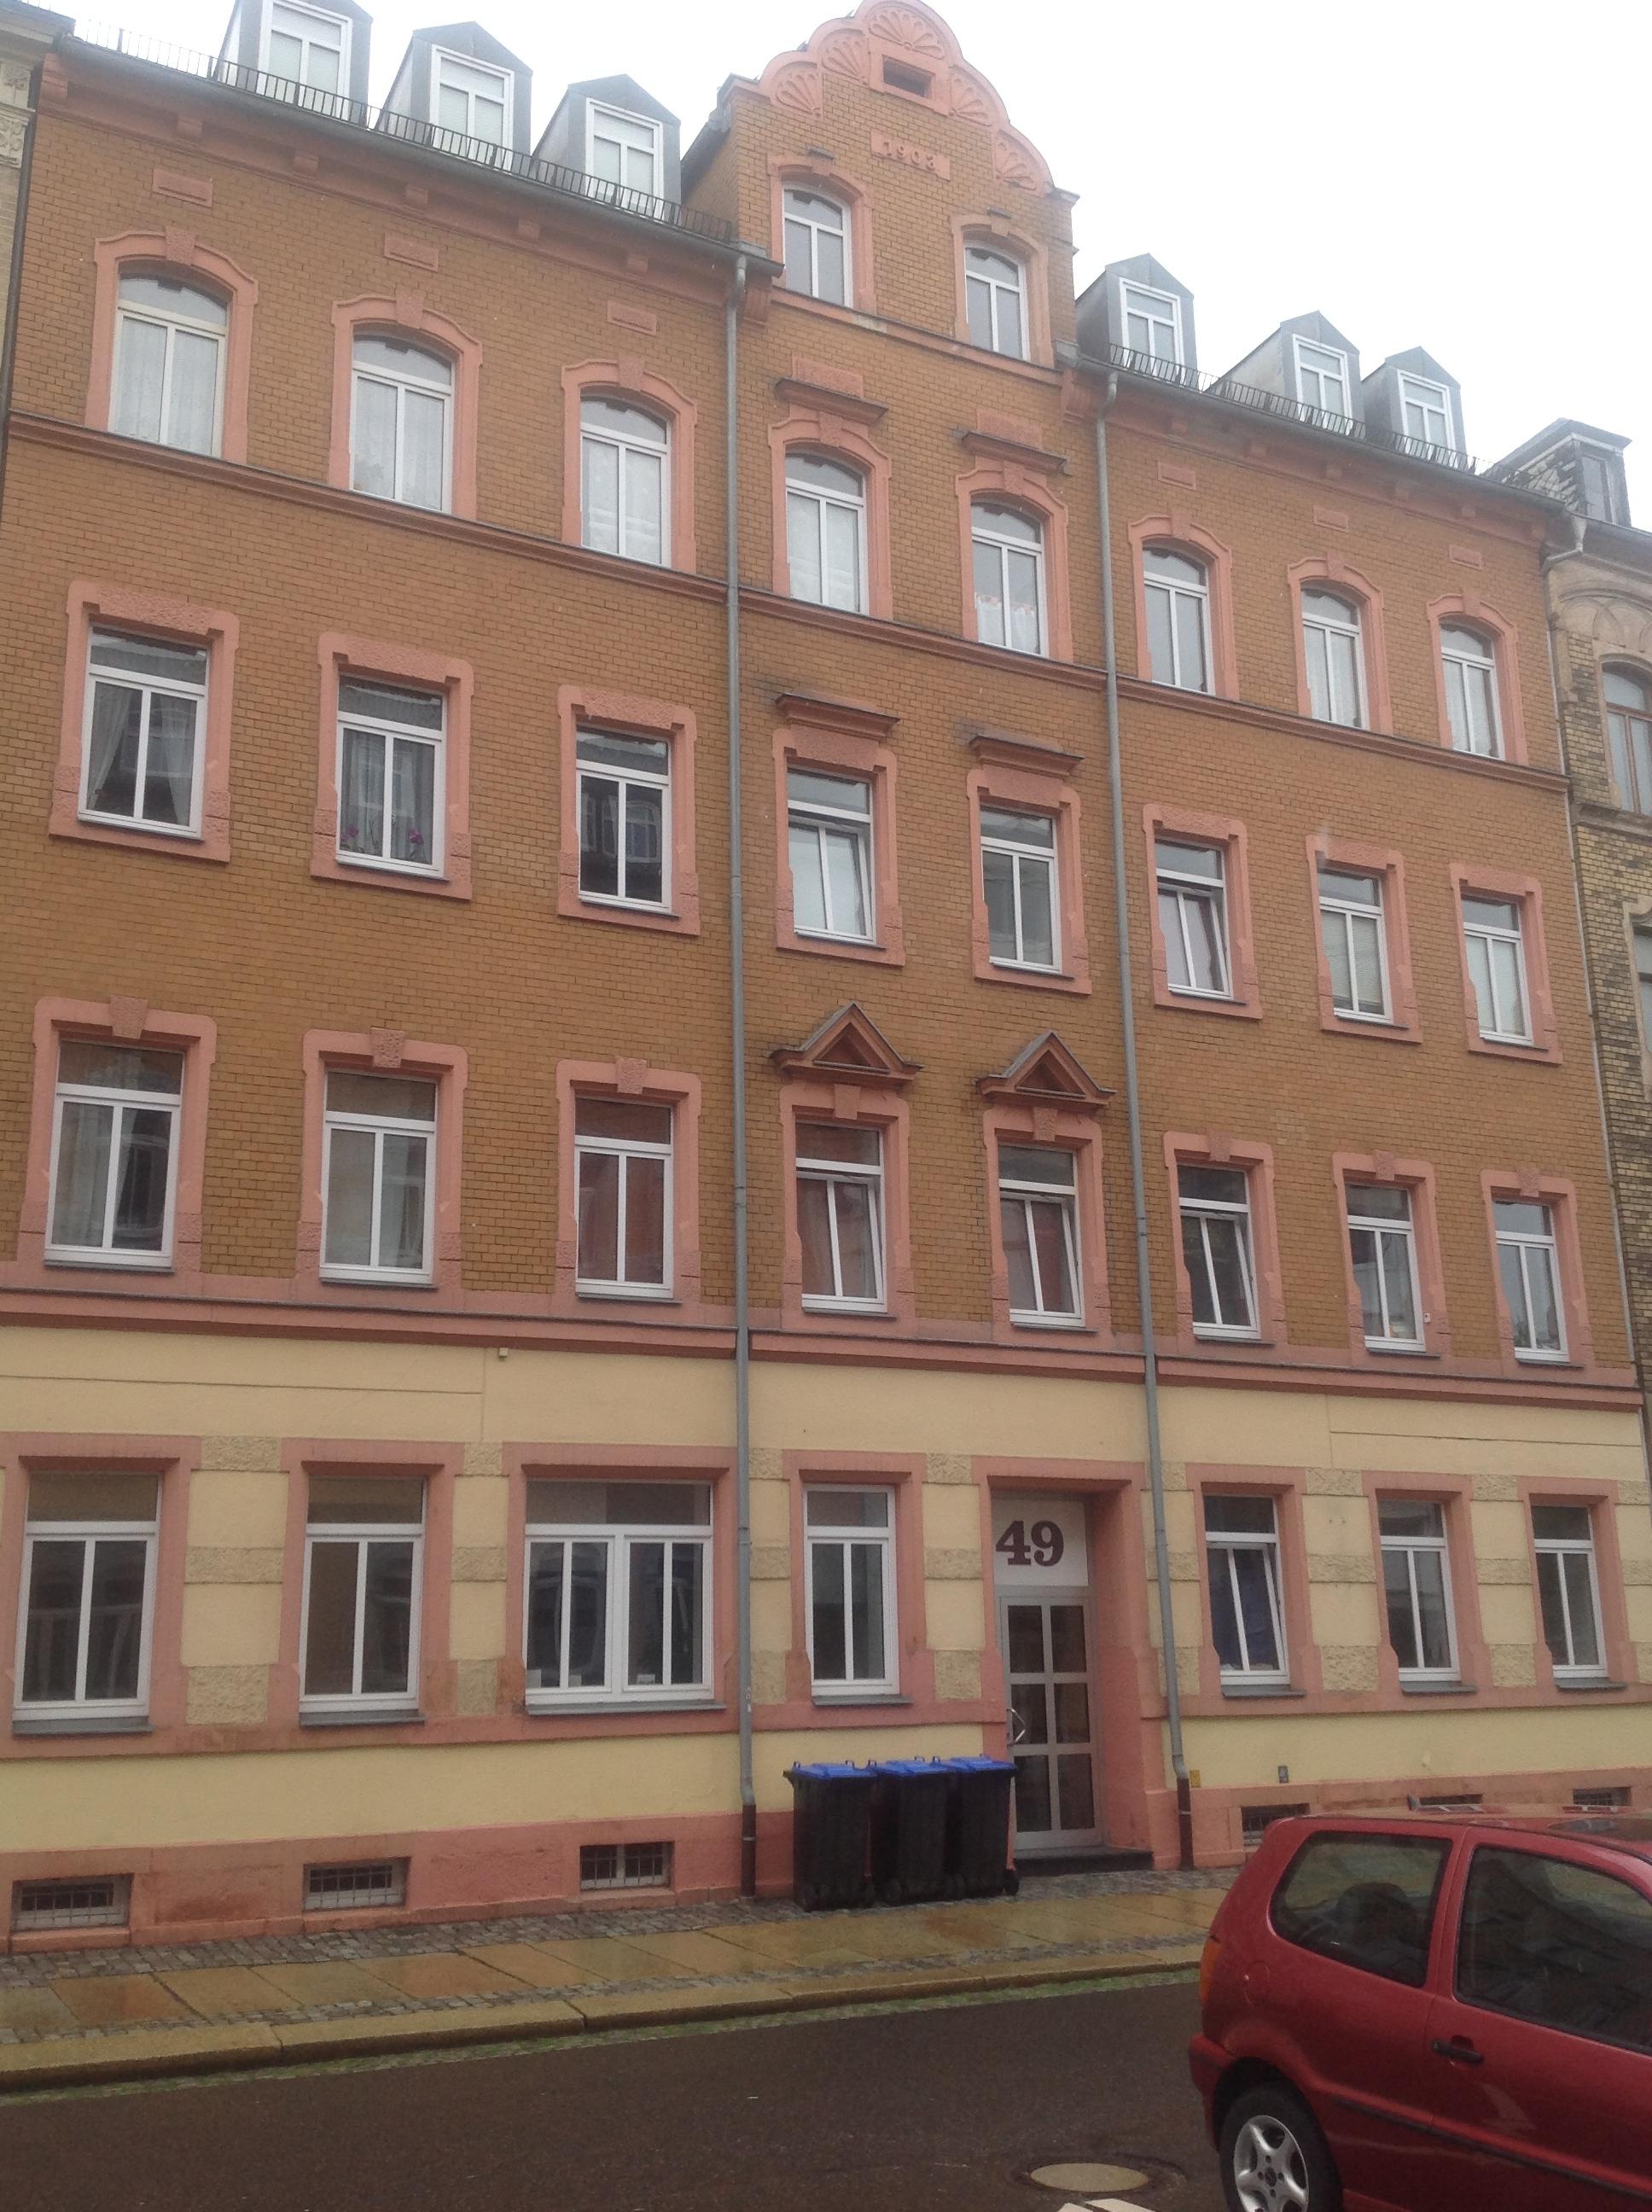 Chemnitz/Sachsen, Mehrfamlienwohnhaus, 14 WE